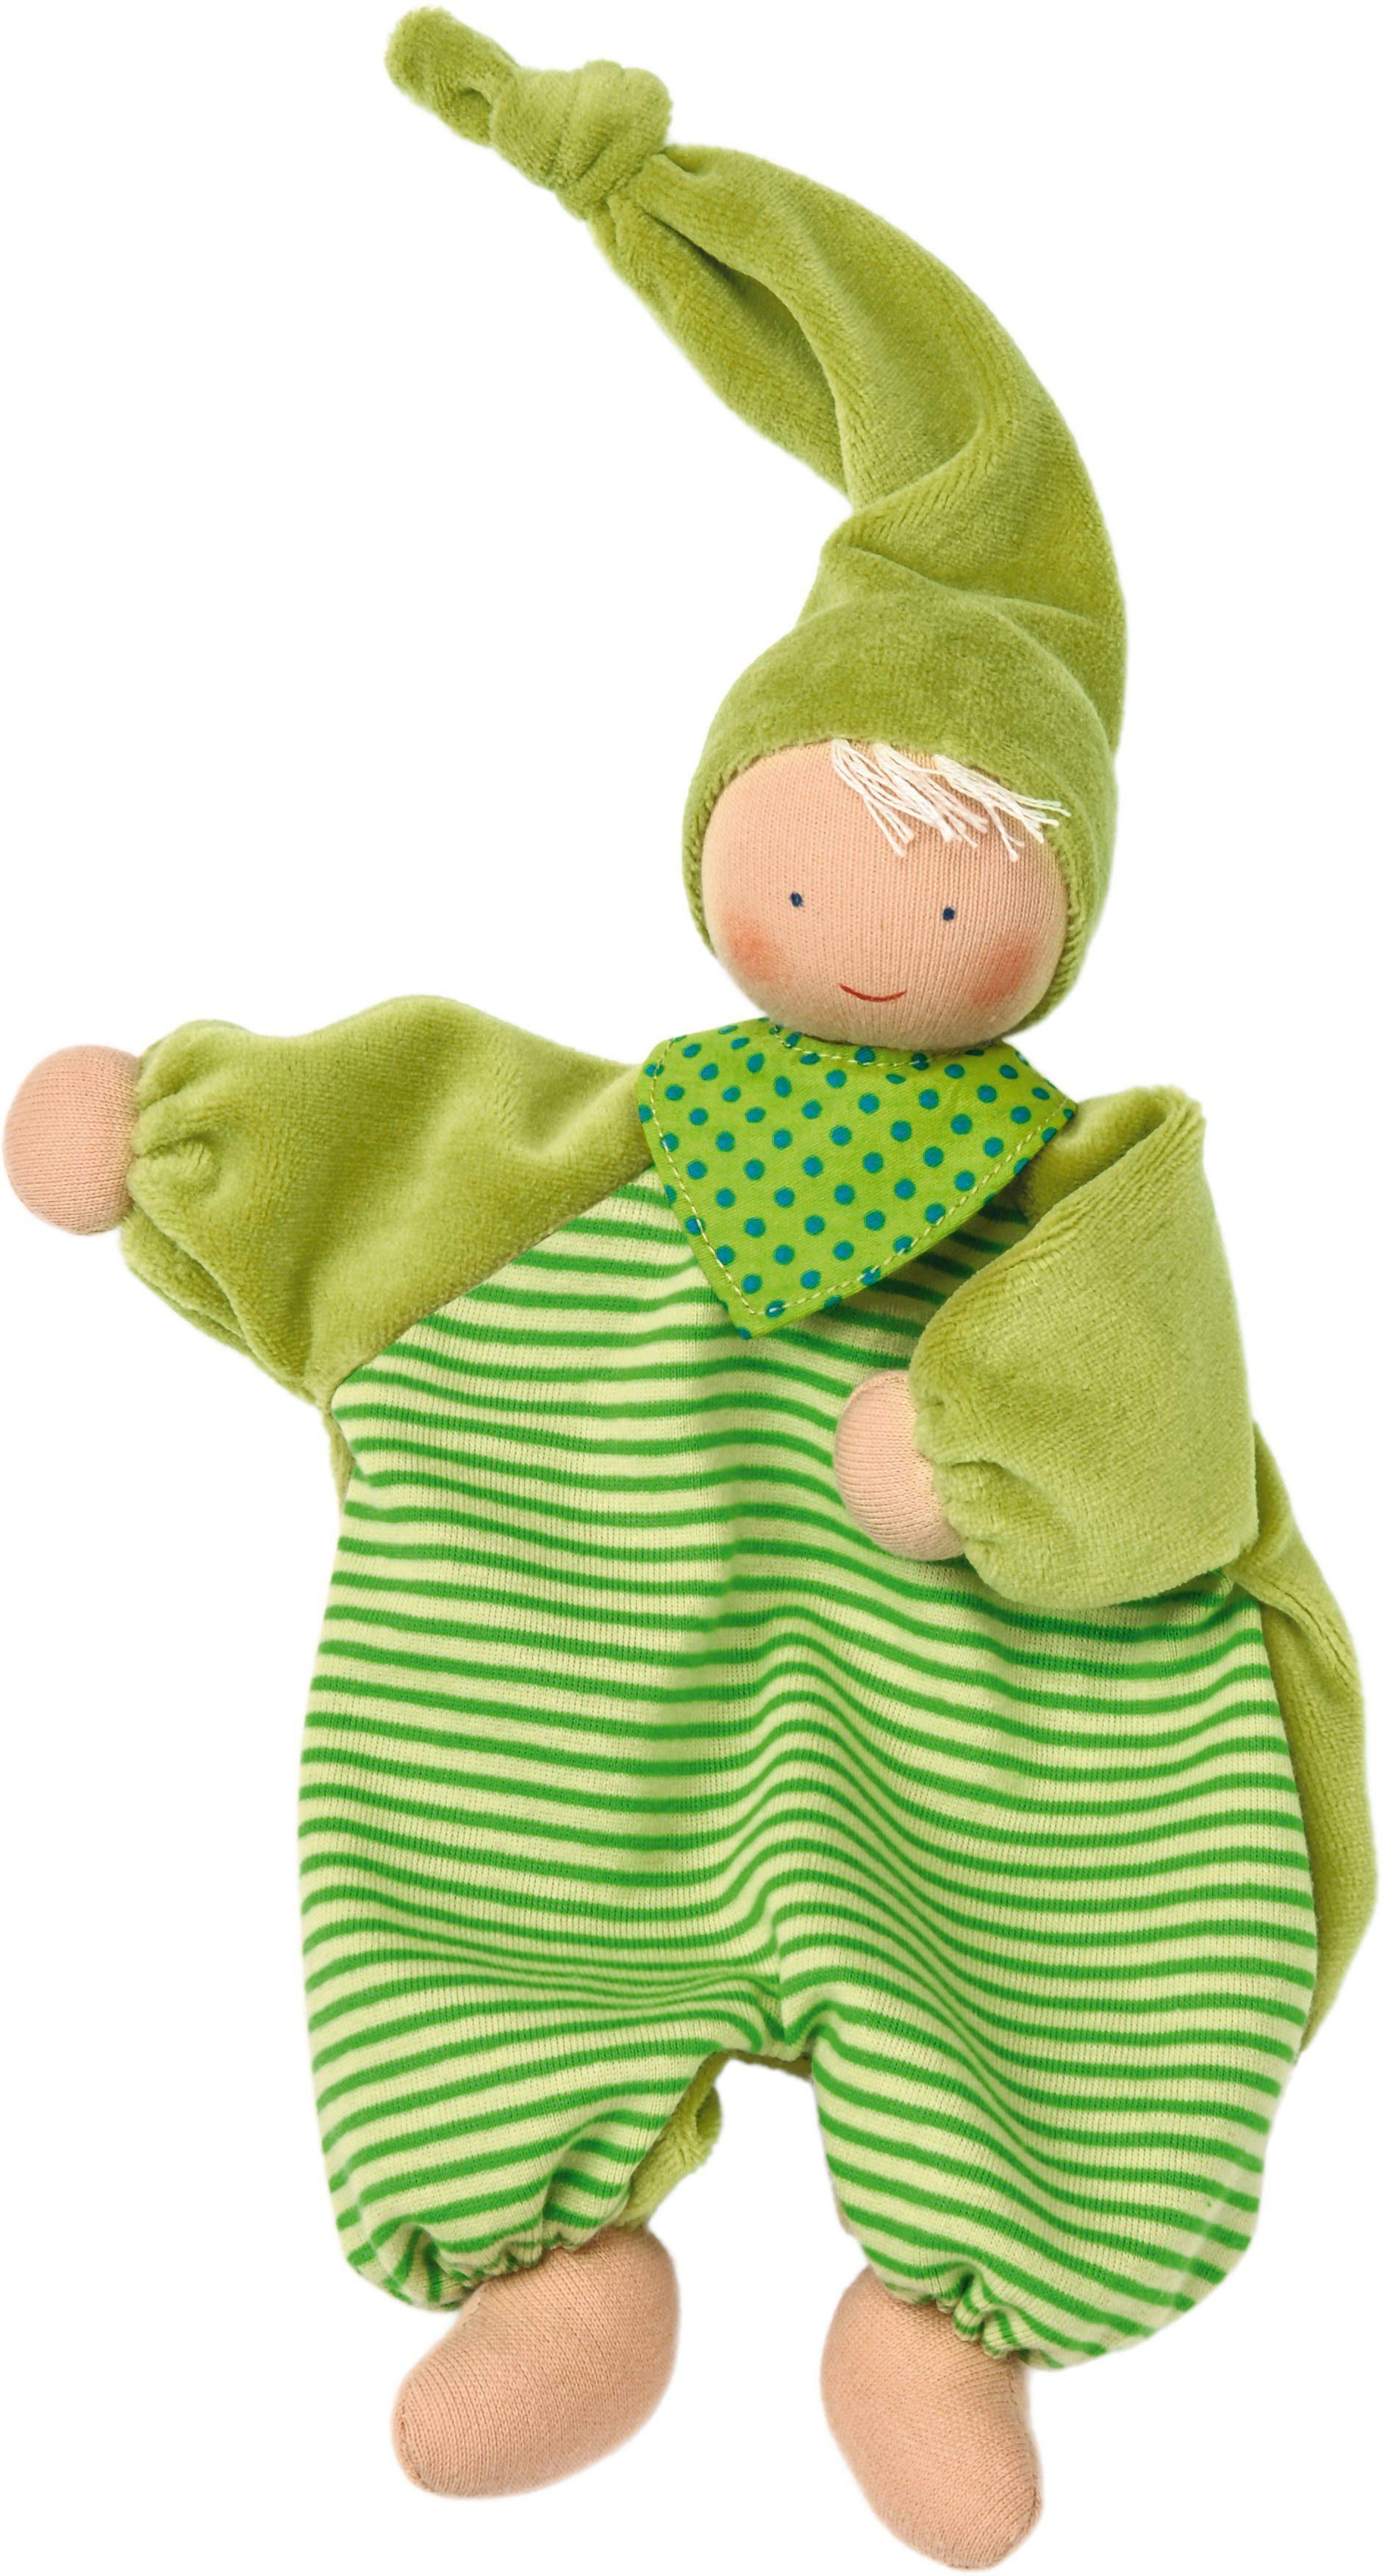 Käthe Kruse Stoffpuppe mit extralanger Zipfelmütze, »Gugguli Grün«